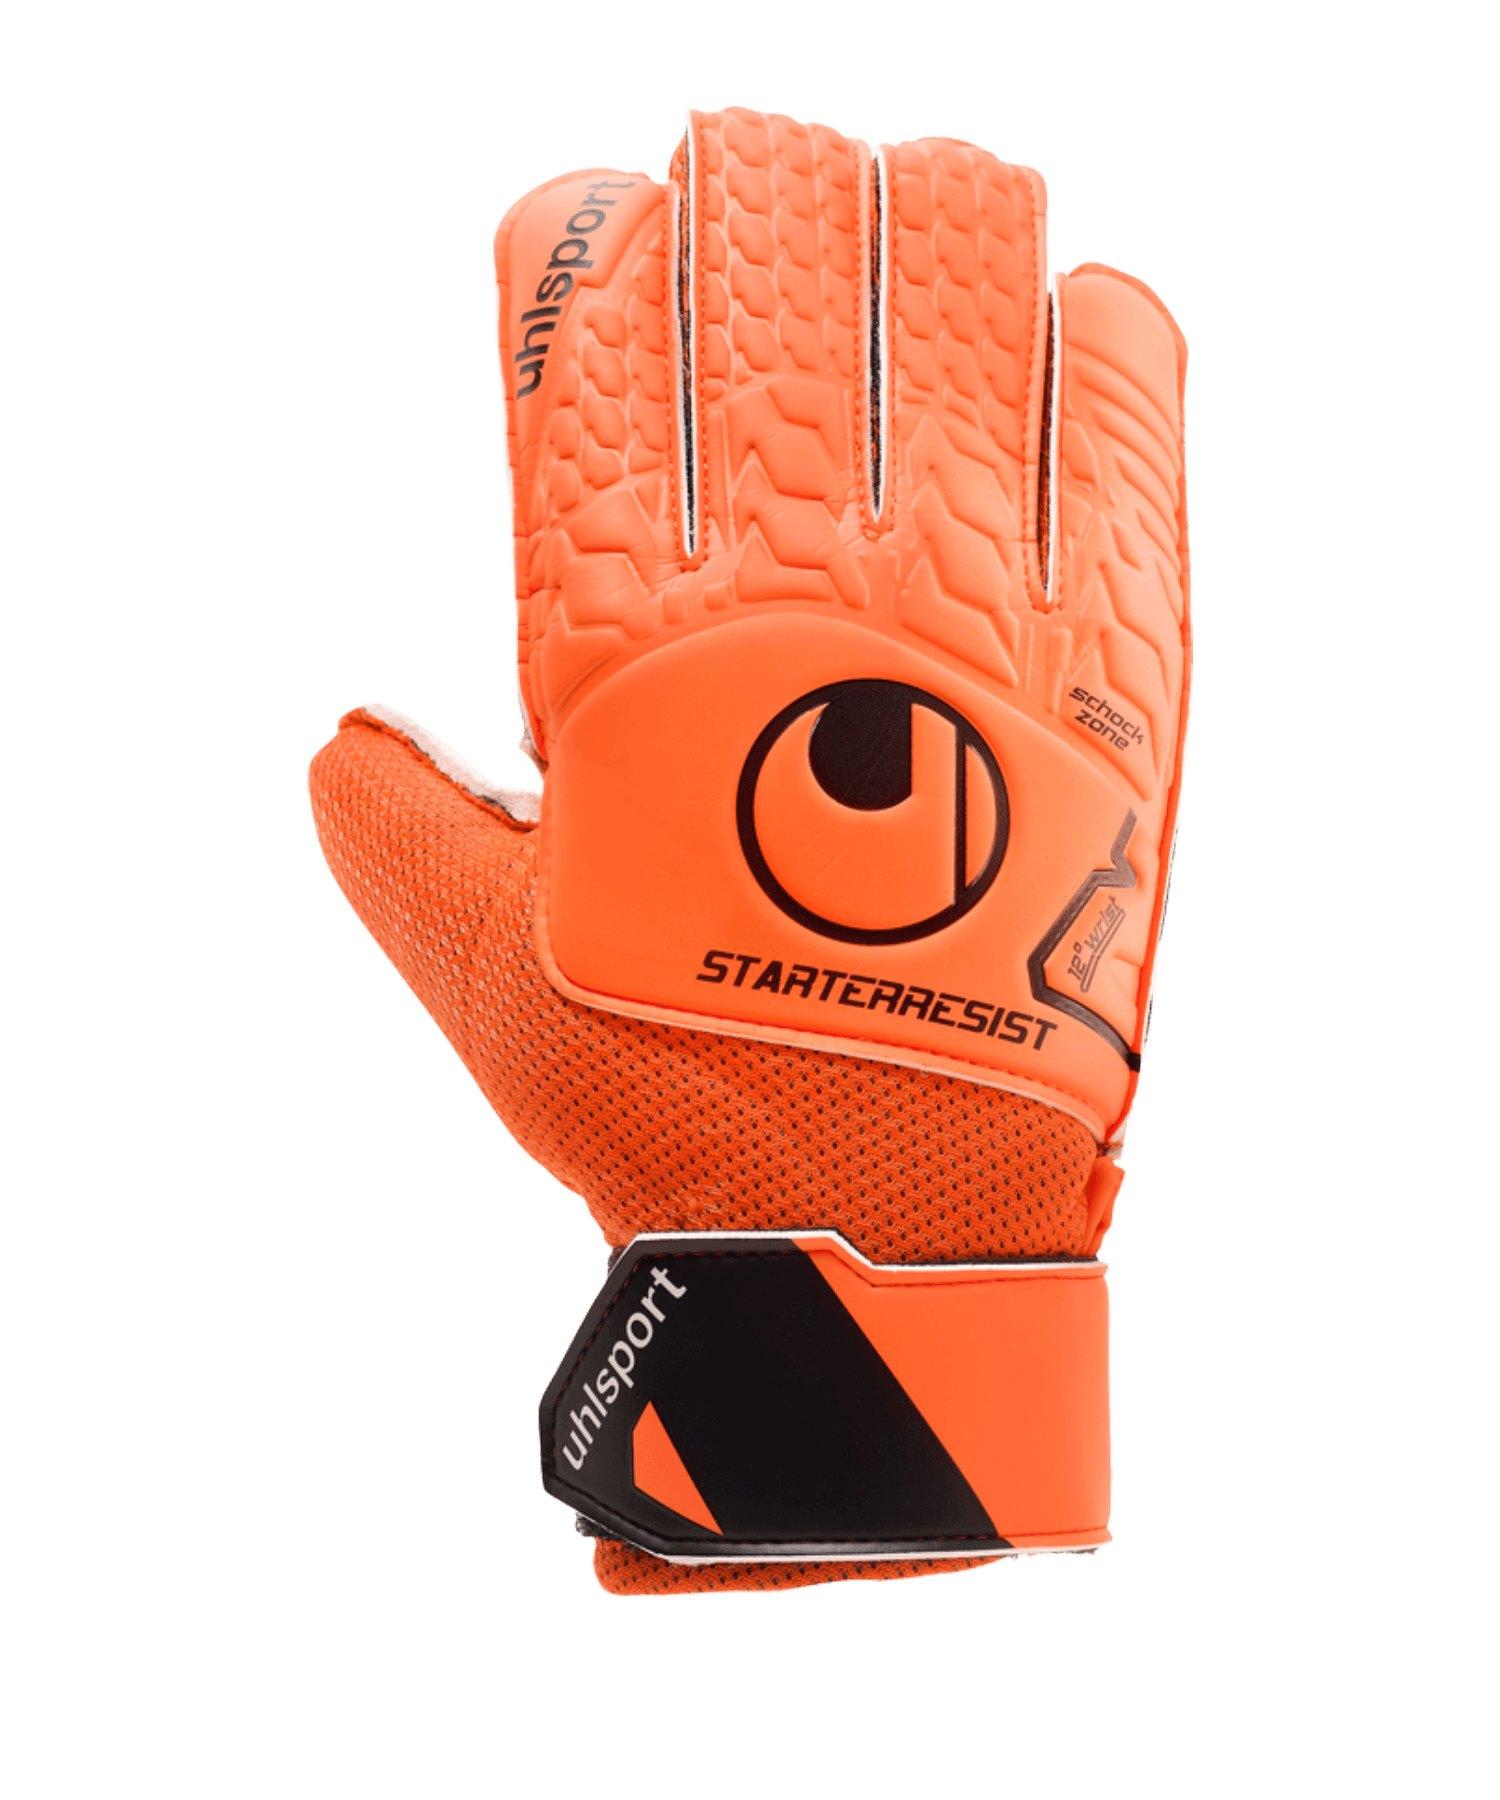 Uhlsport Starter Resist Torwarthandschuh F01 - orange